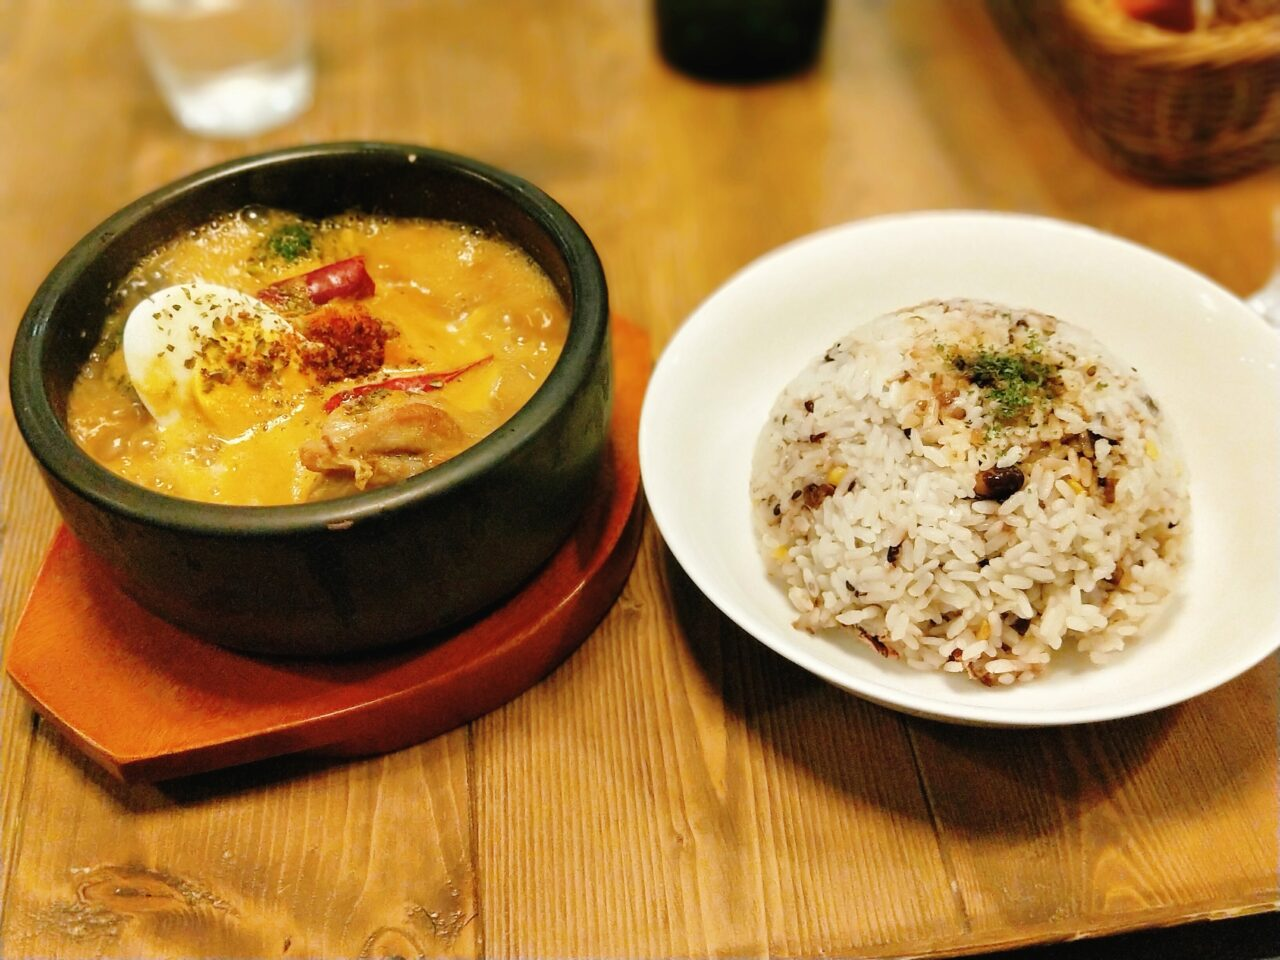 Spice&Sweets KAJU(梅田駅・カレー、カフェ)